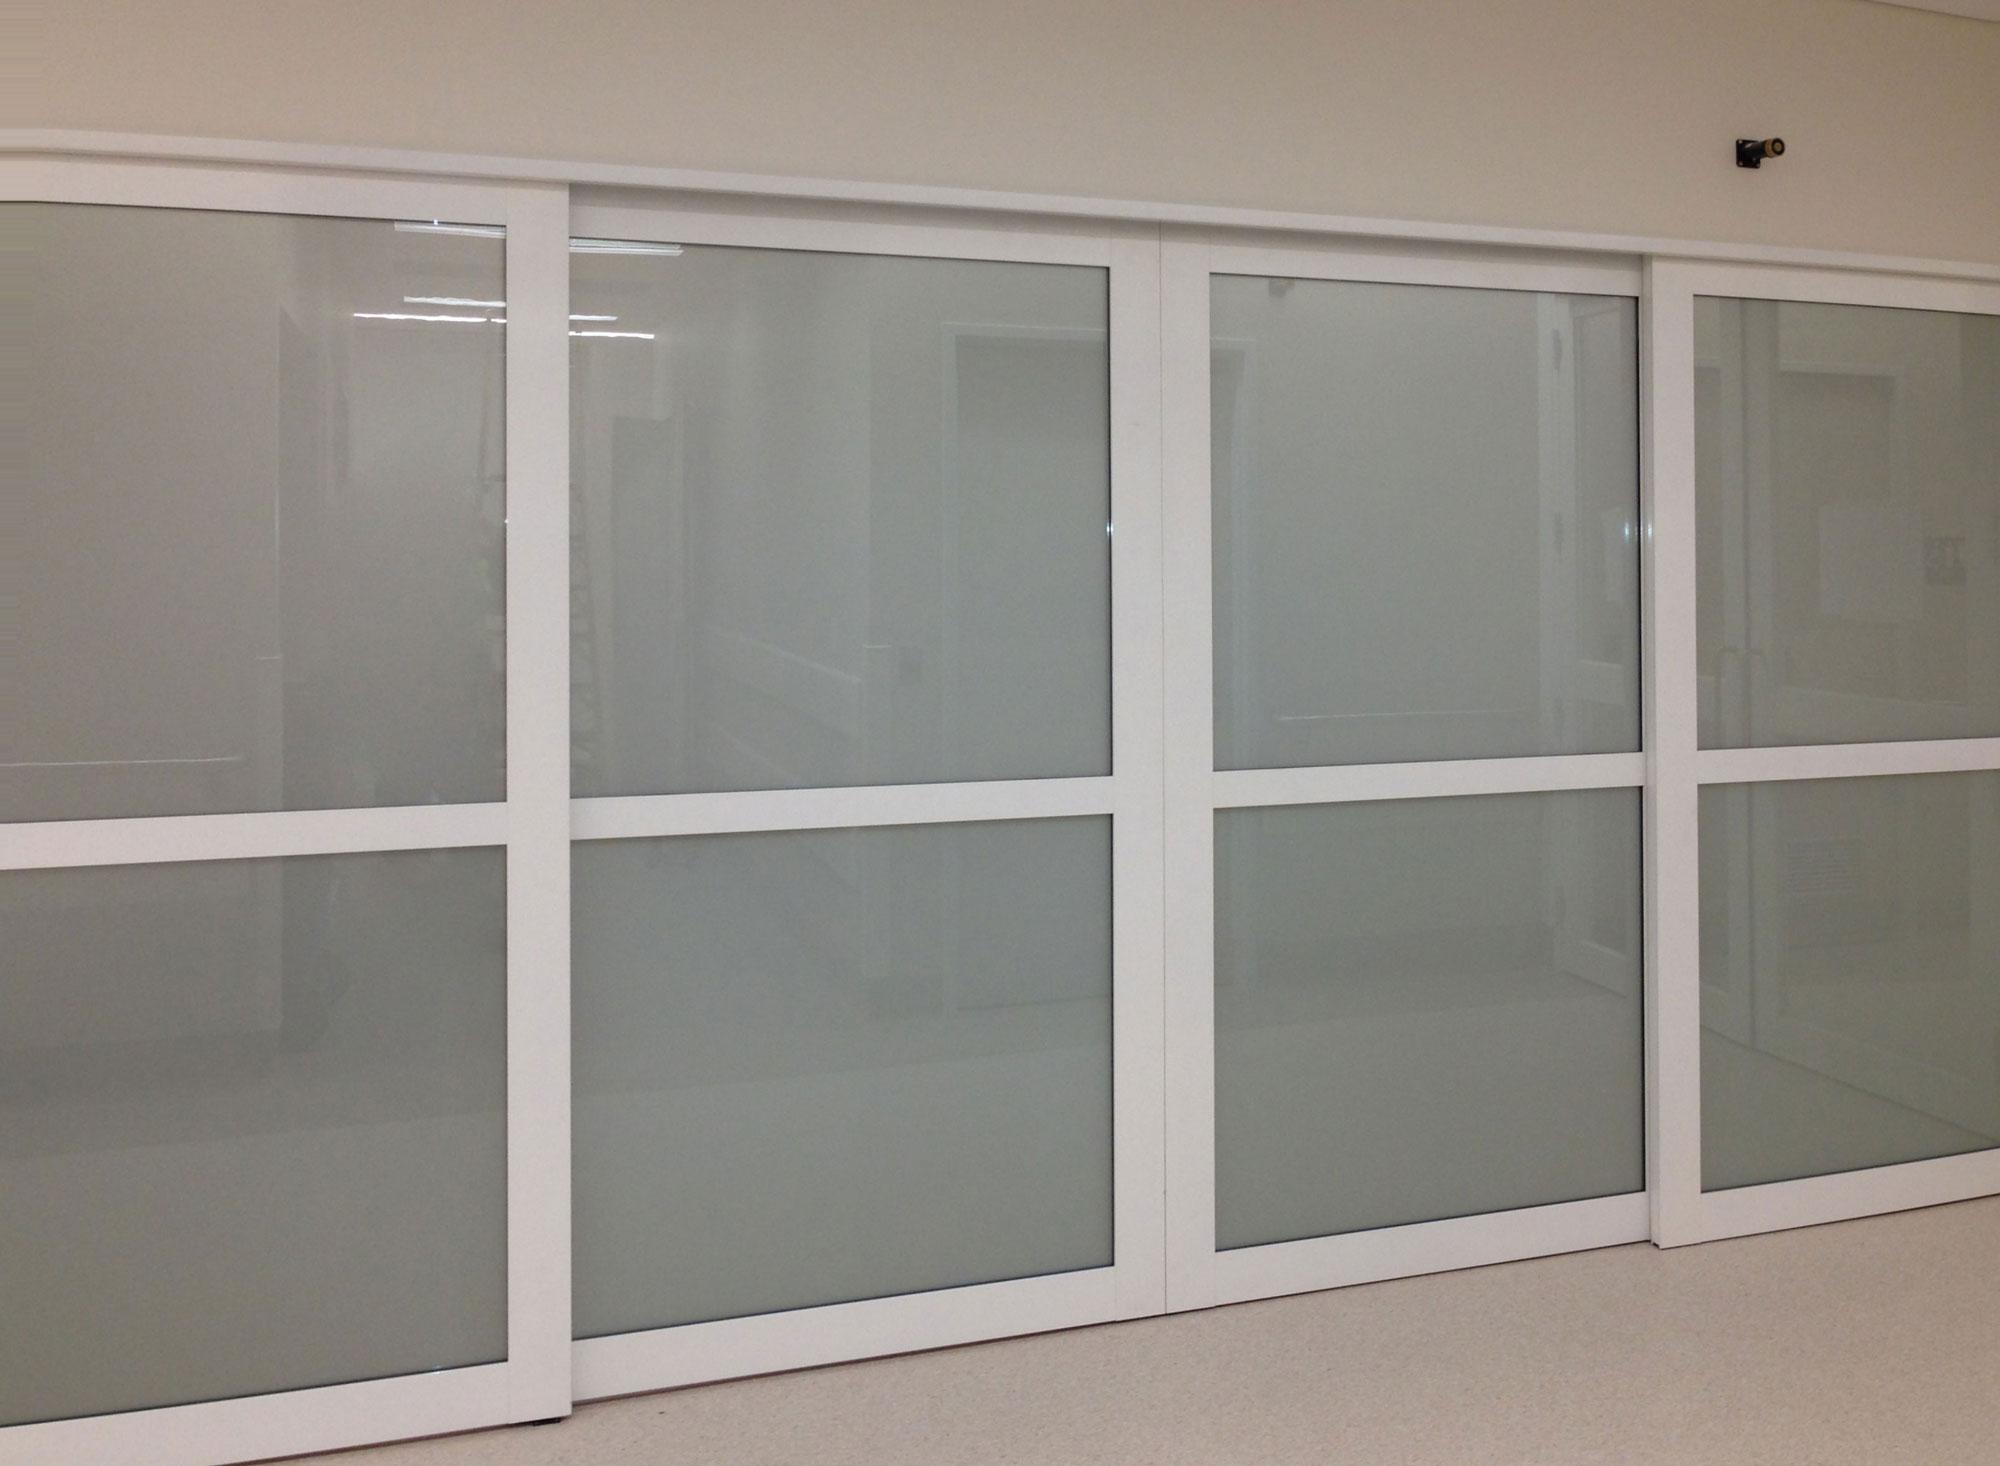 Commercial Sliding Door Tracks Gallery Cs Cavity Sliders